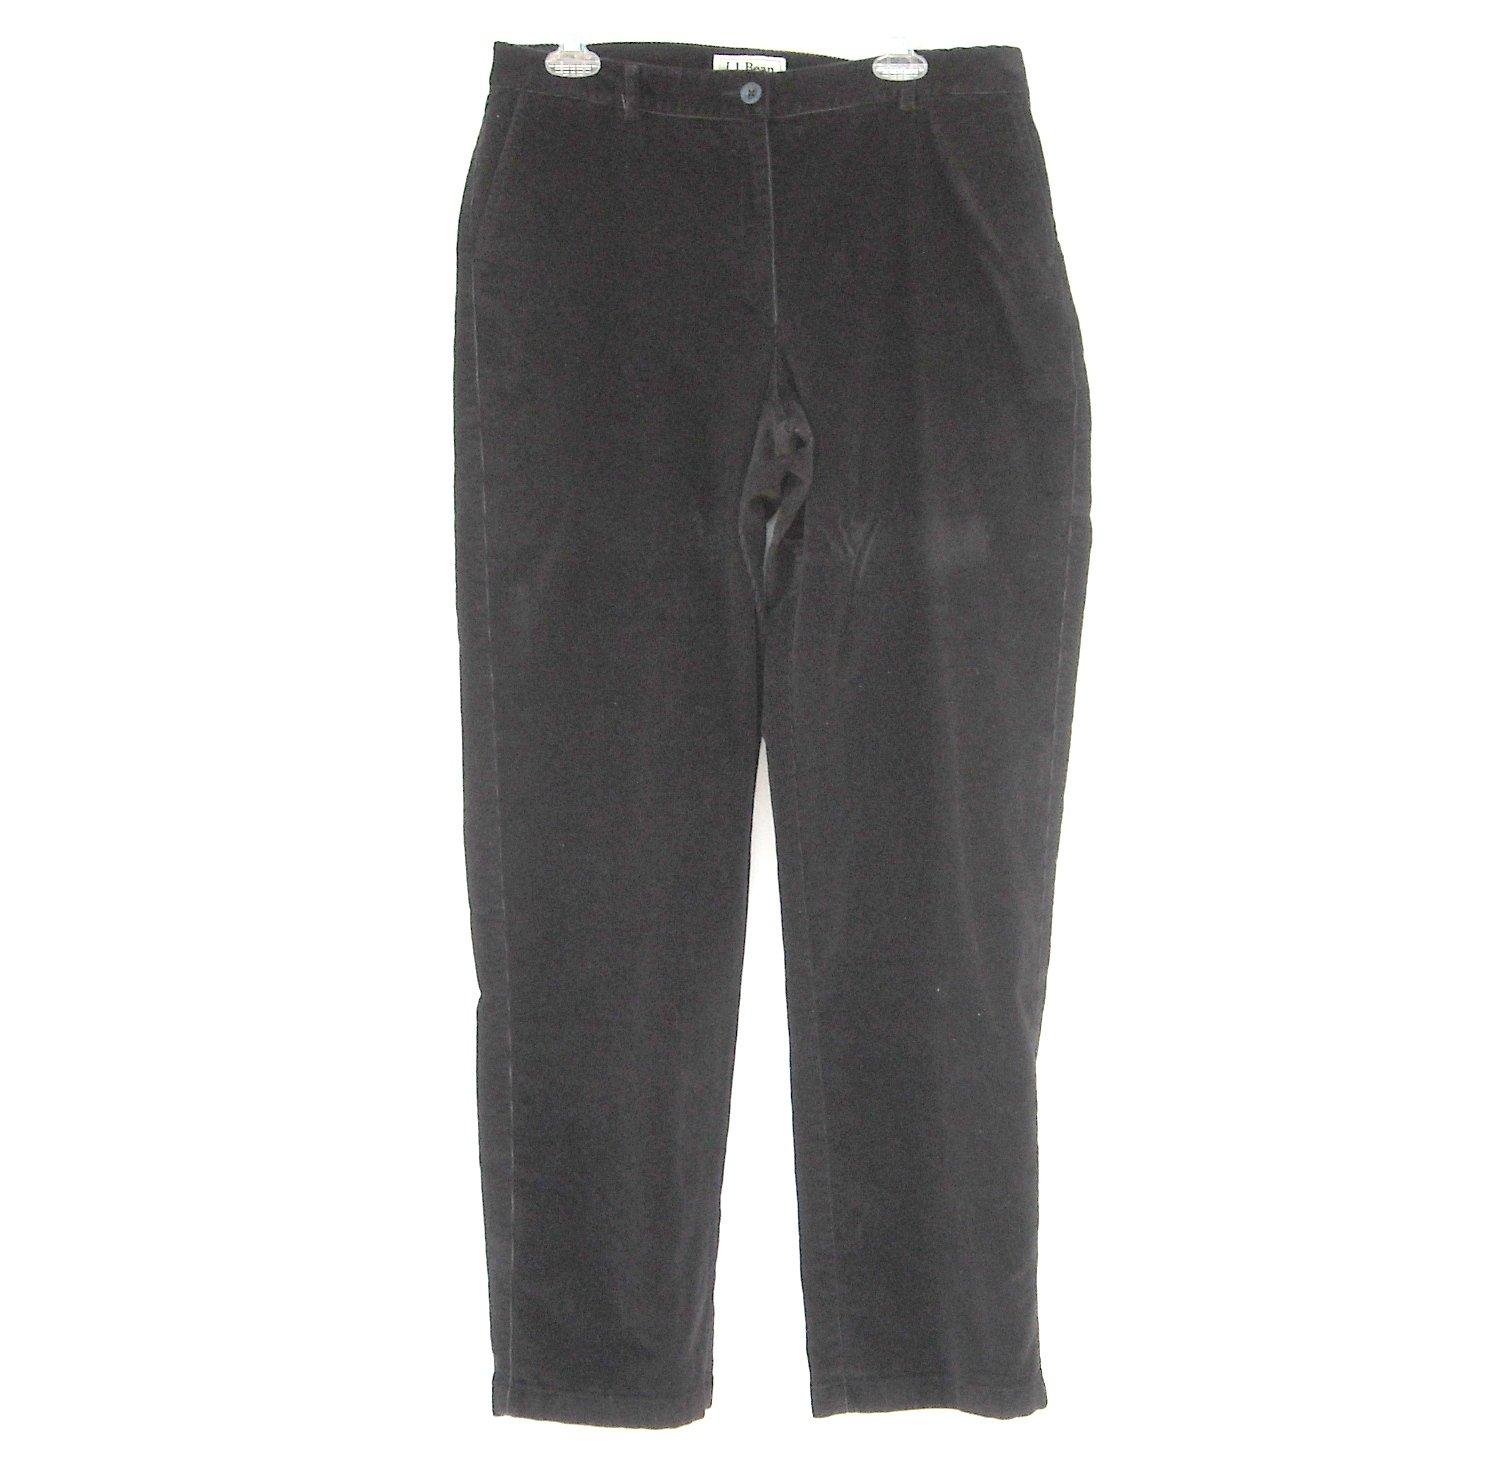 L L Bean Straight Fit Misses Black Corduroy Pants size 12 Tall